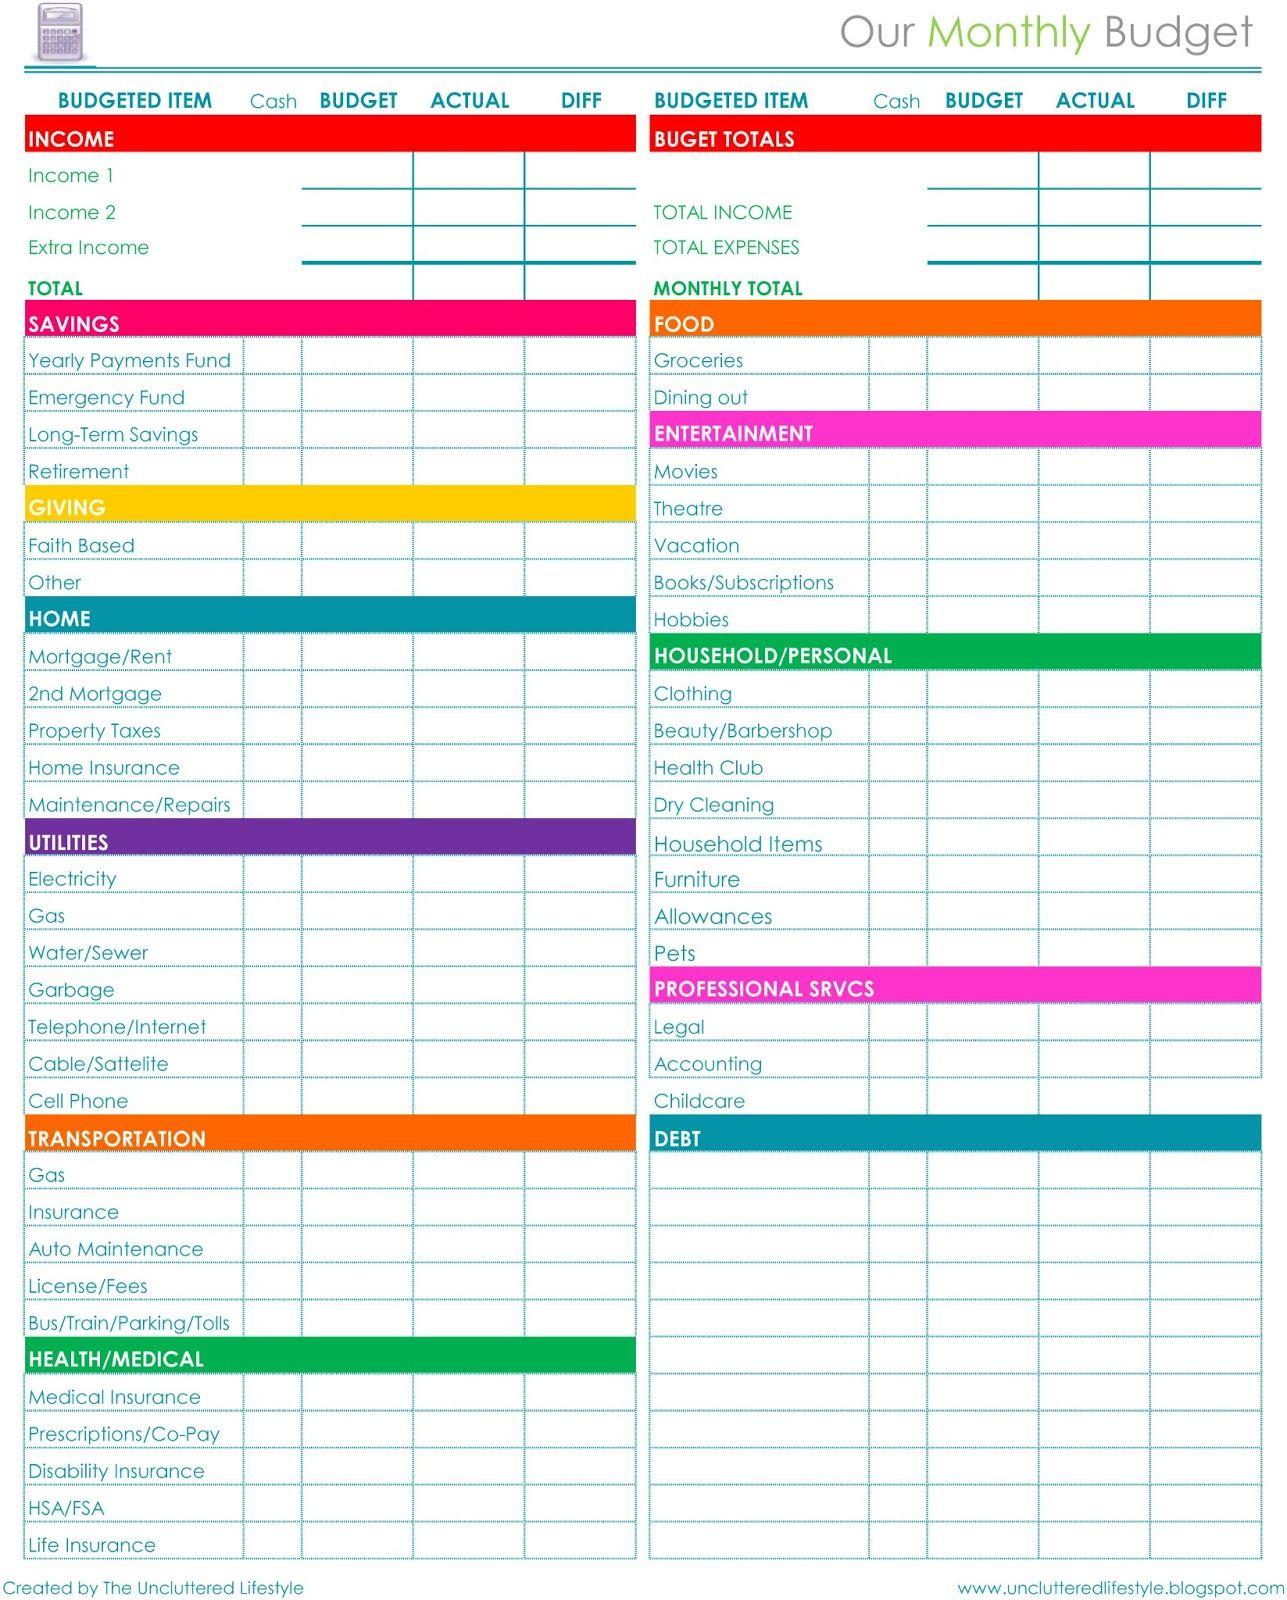 Pinprintables Kathy Loves <3 On Binders~Home Organization - Free Printable Home Organization Worksheets